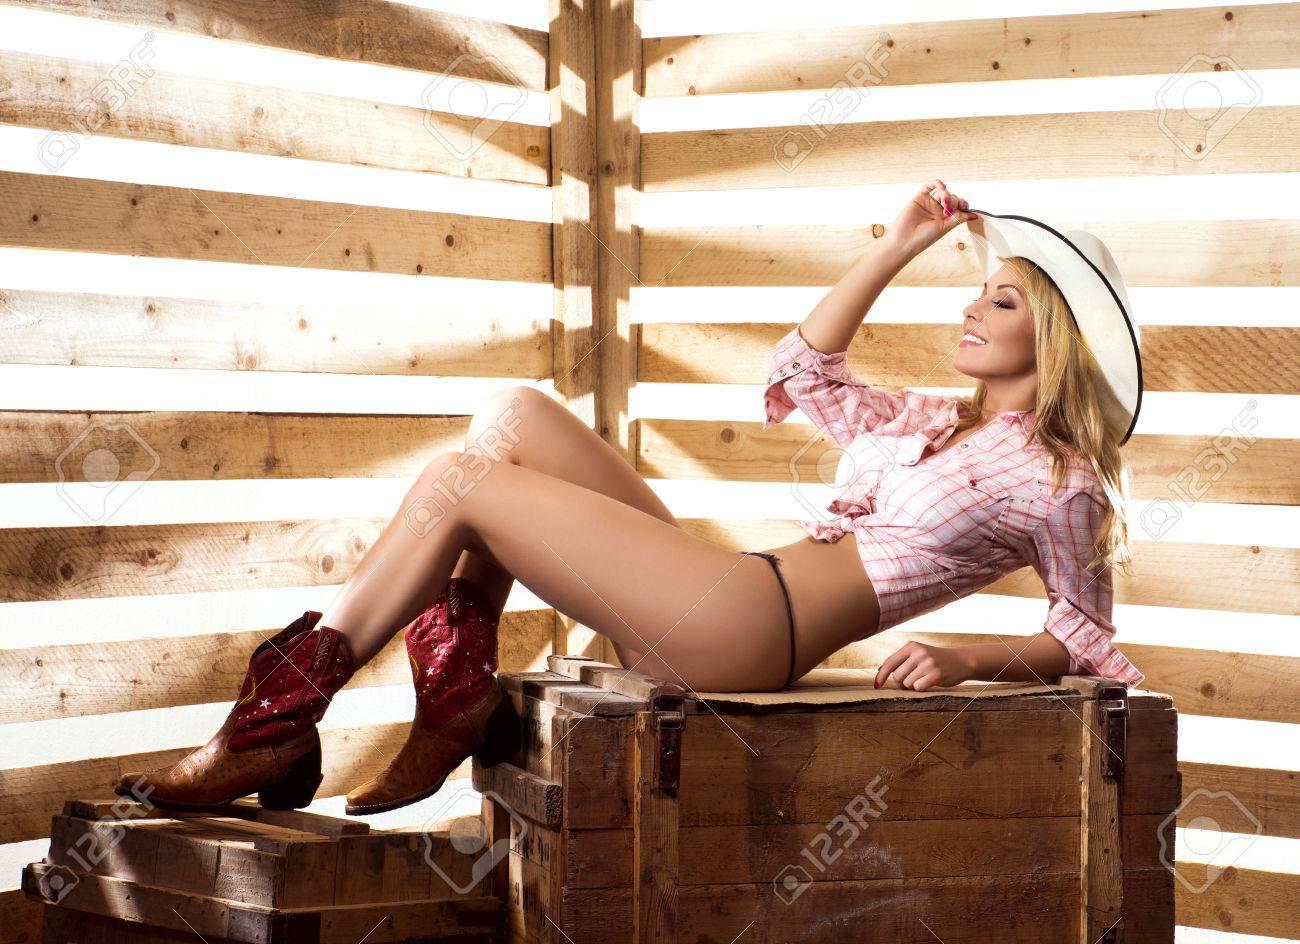 Free naked cowgirl pics, Lesbian girls kiss video